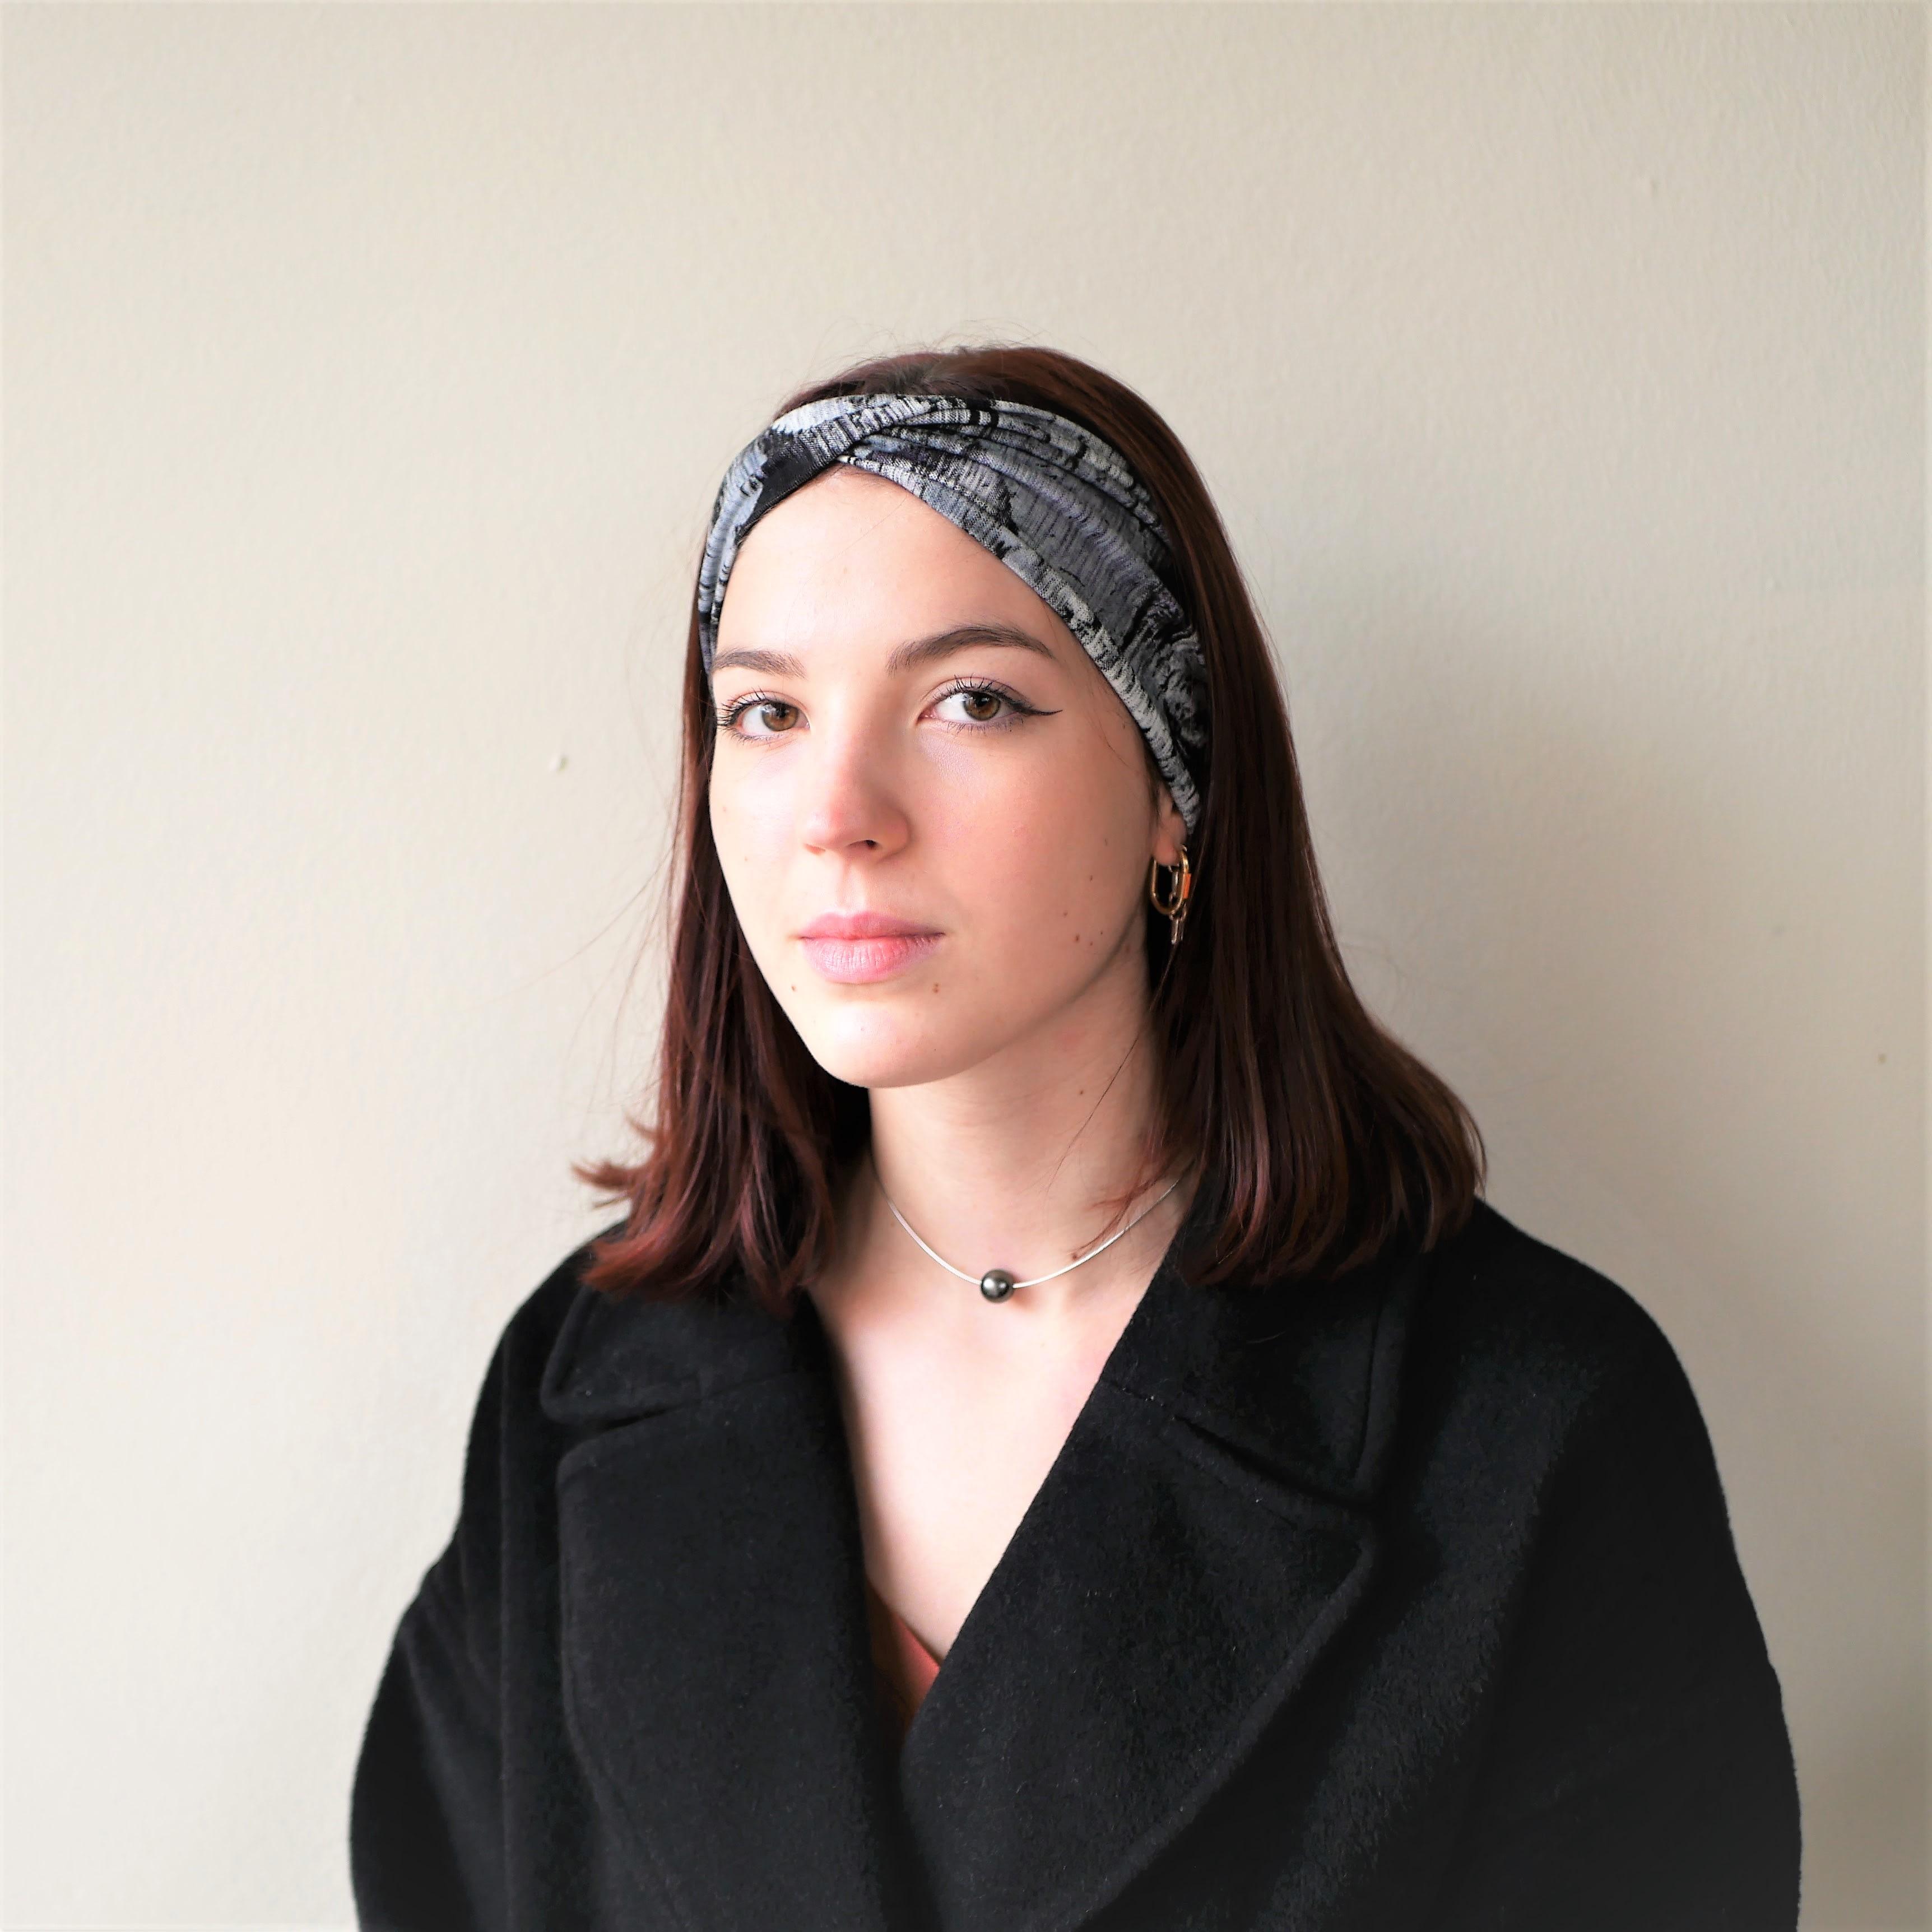 Double twist headband, wide headband, turban headband, yoga headband, workout headband